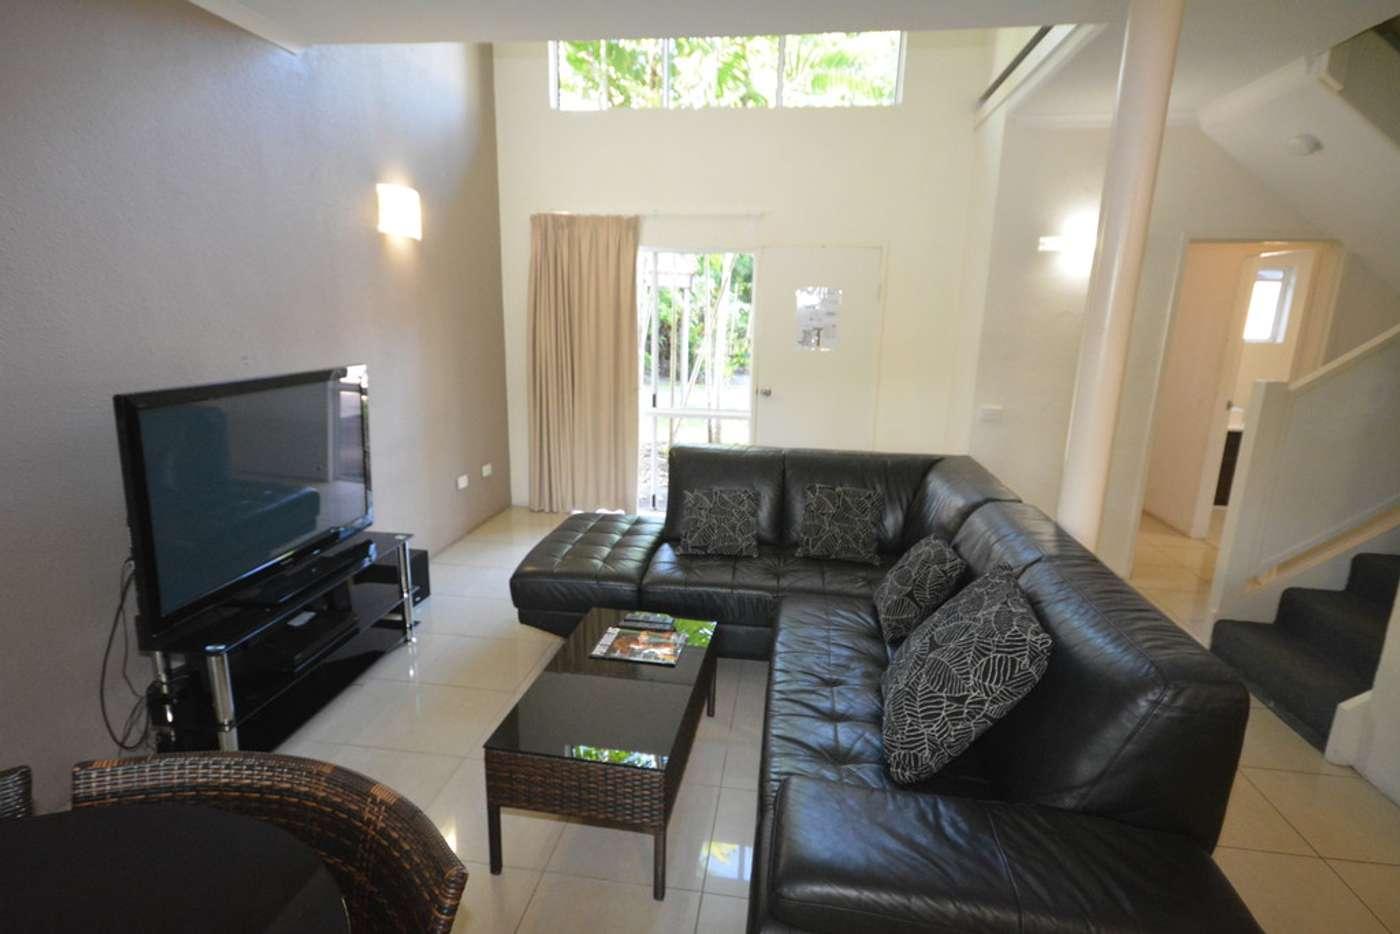 Main view of Homely unit listing, 14/121-137 Port Douglas Rd, Reef Resort, Port Douglas QLD 4877